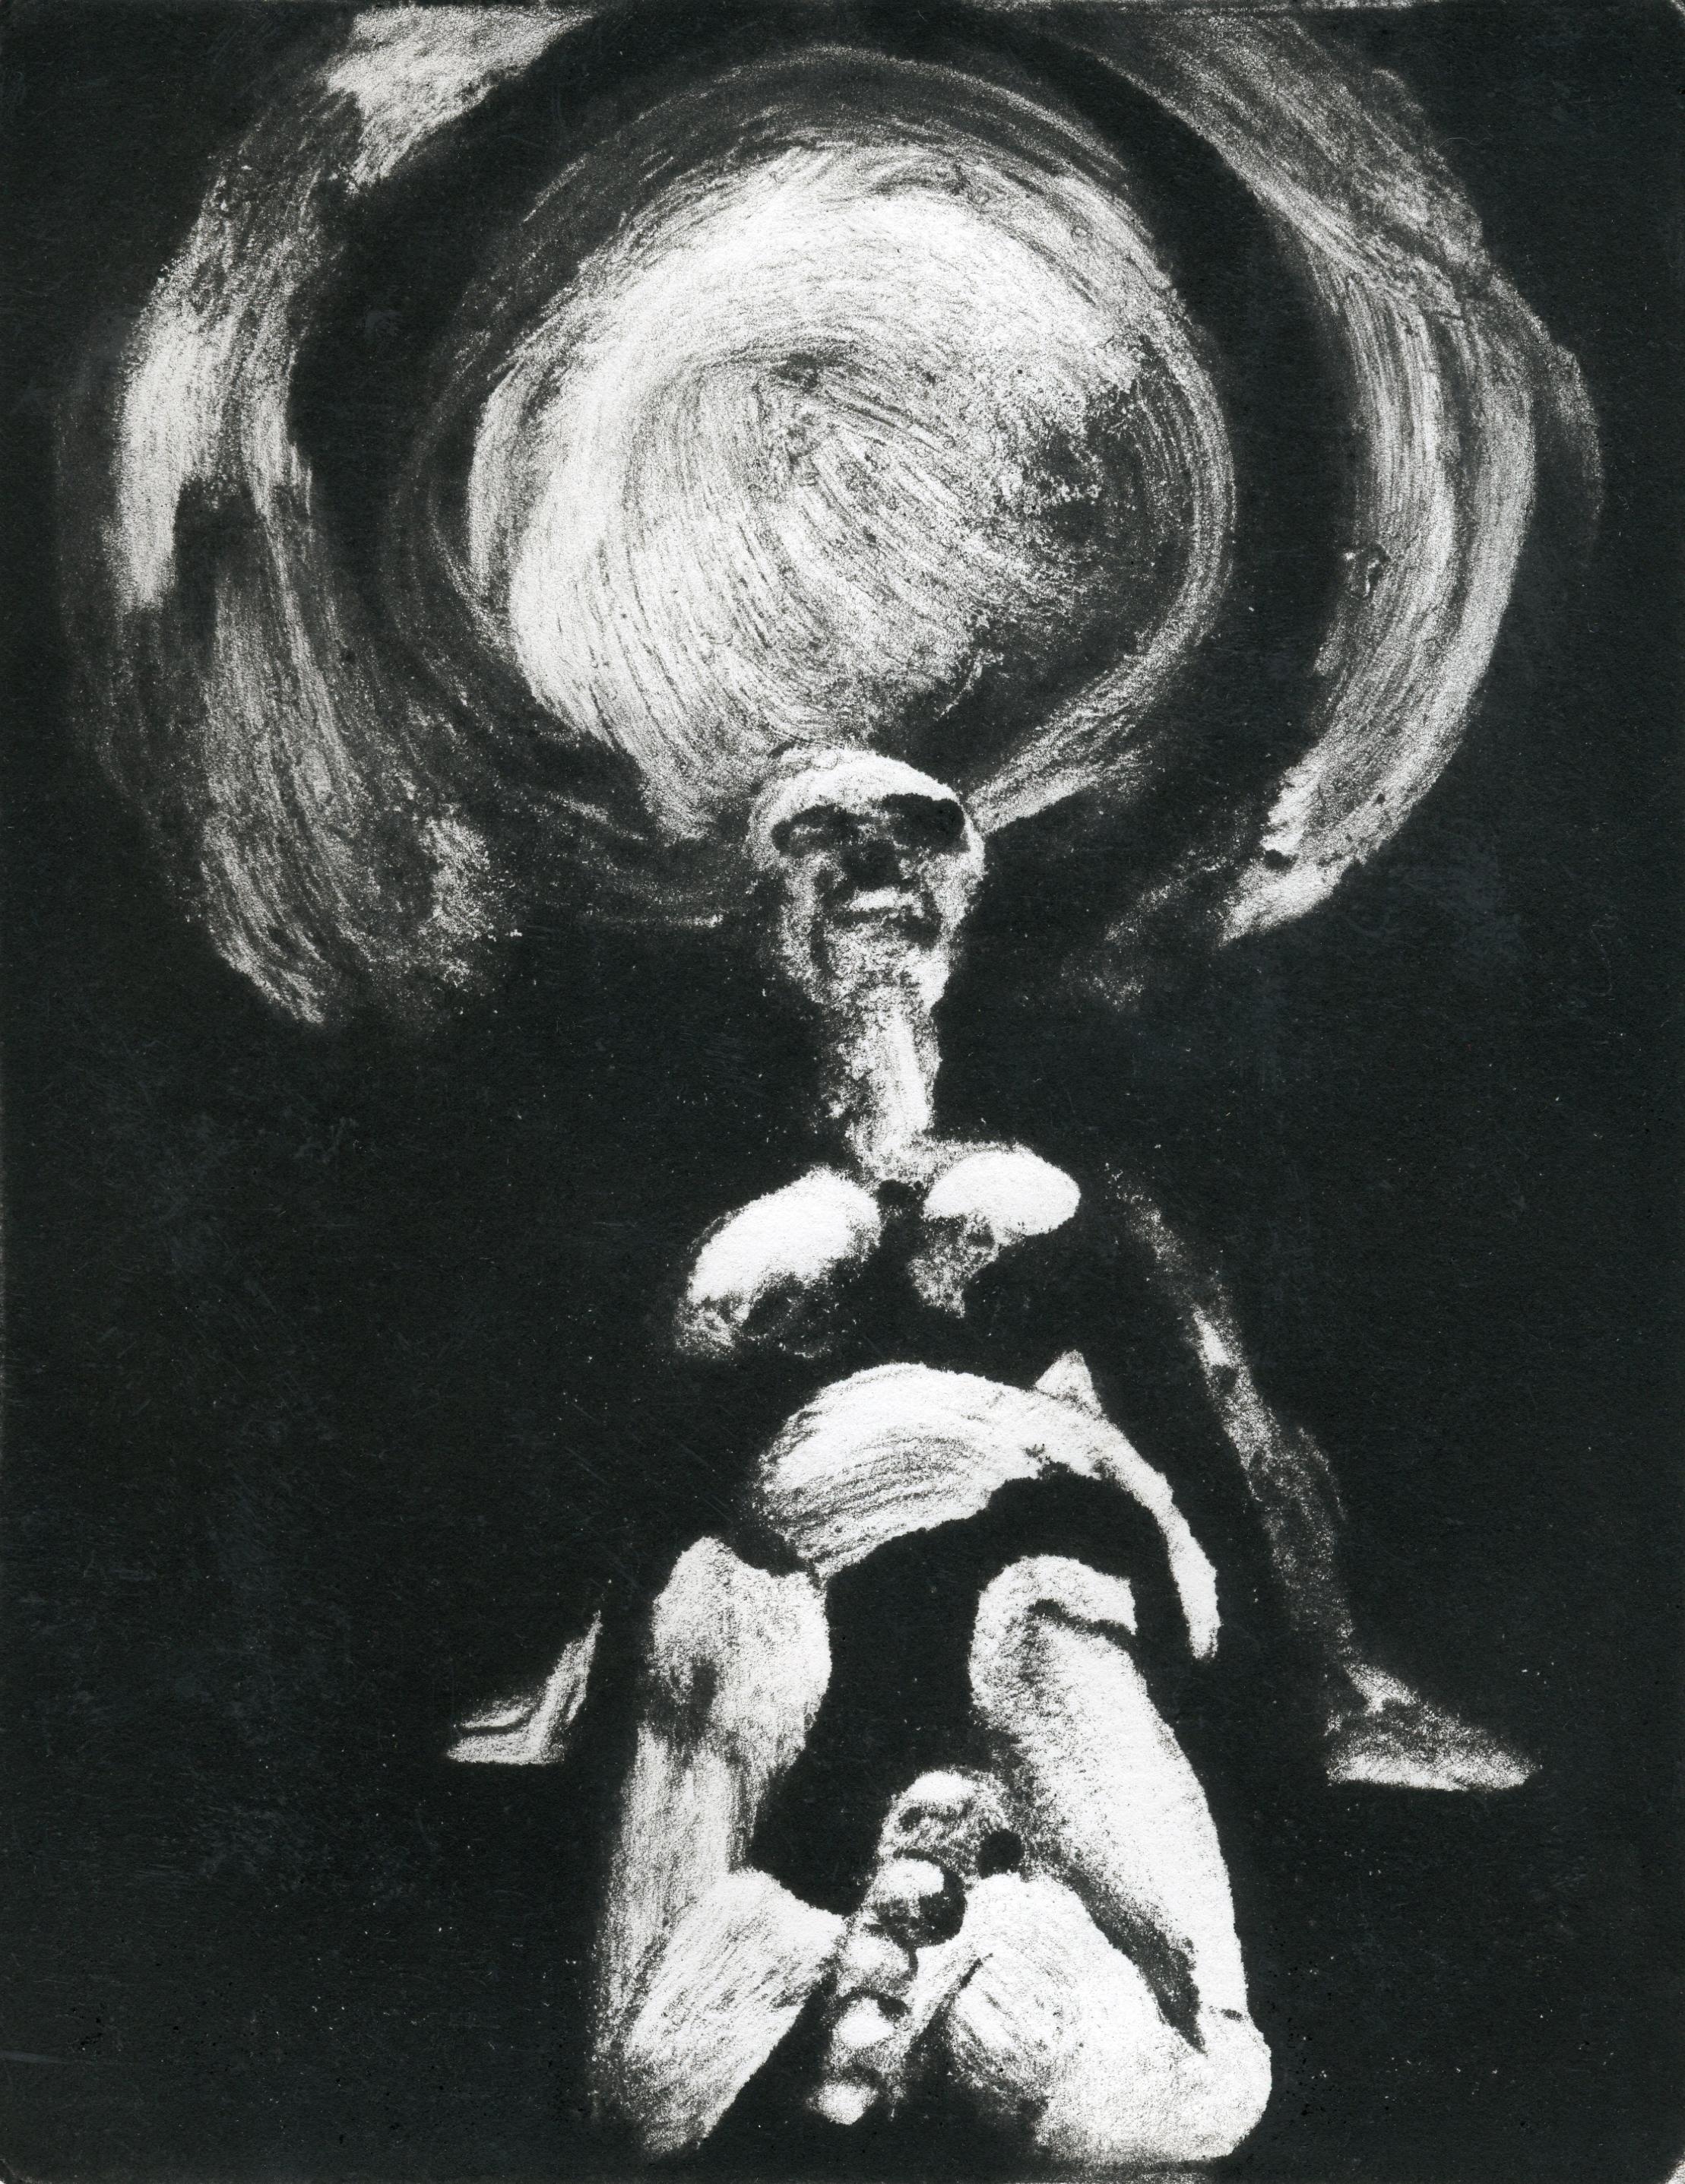 the artist waits